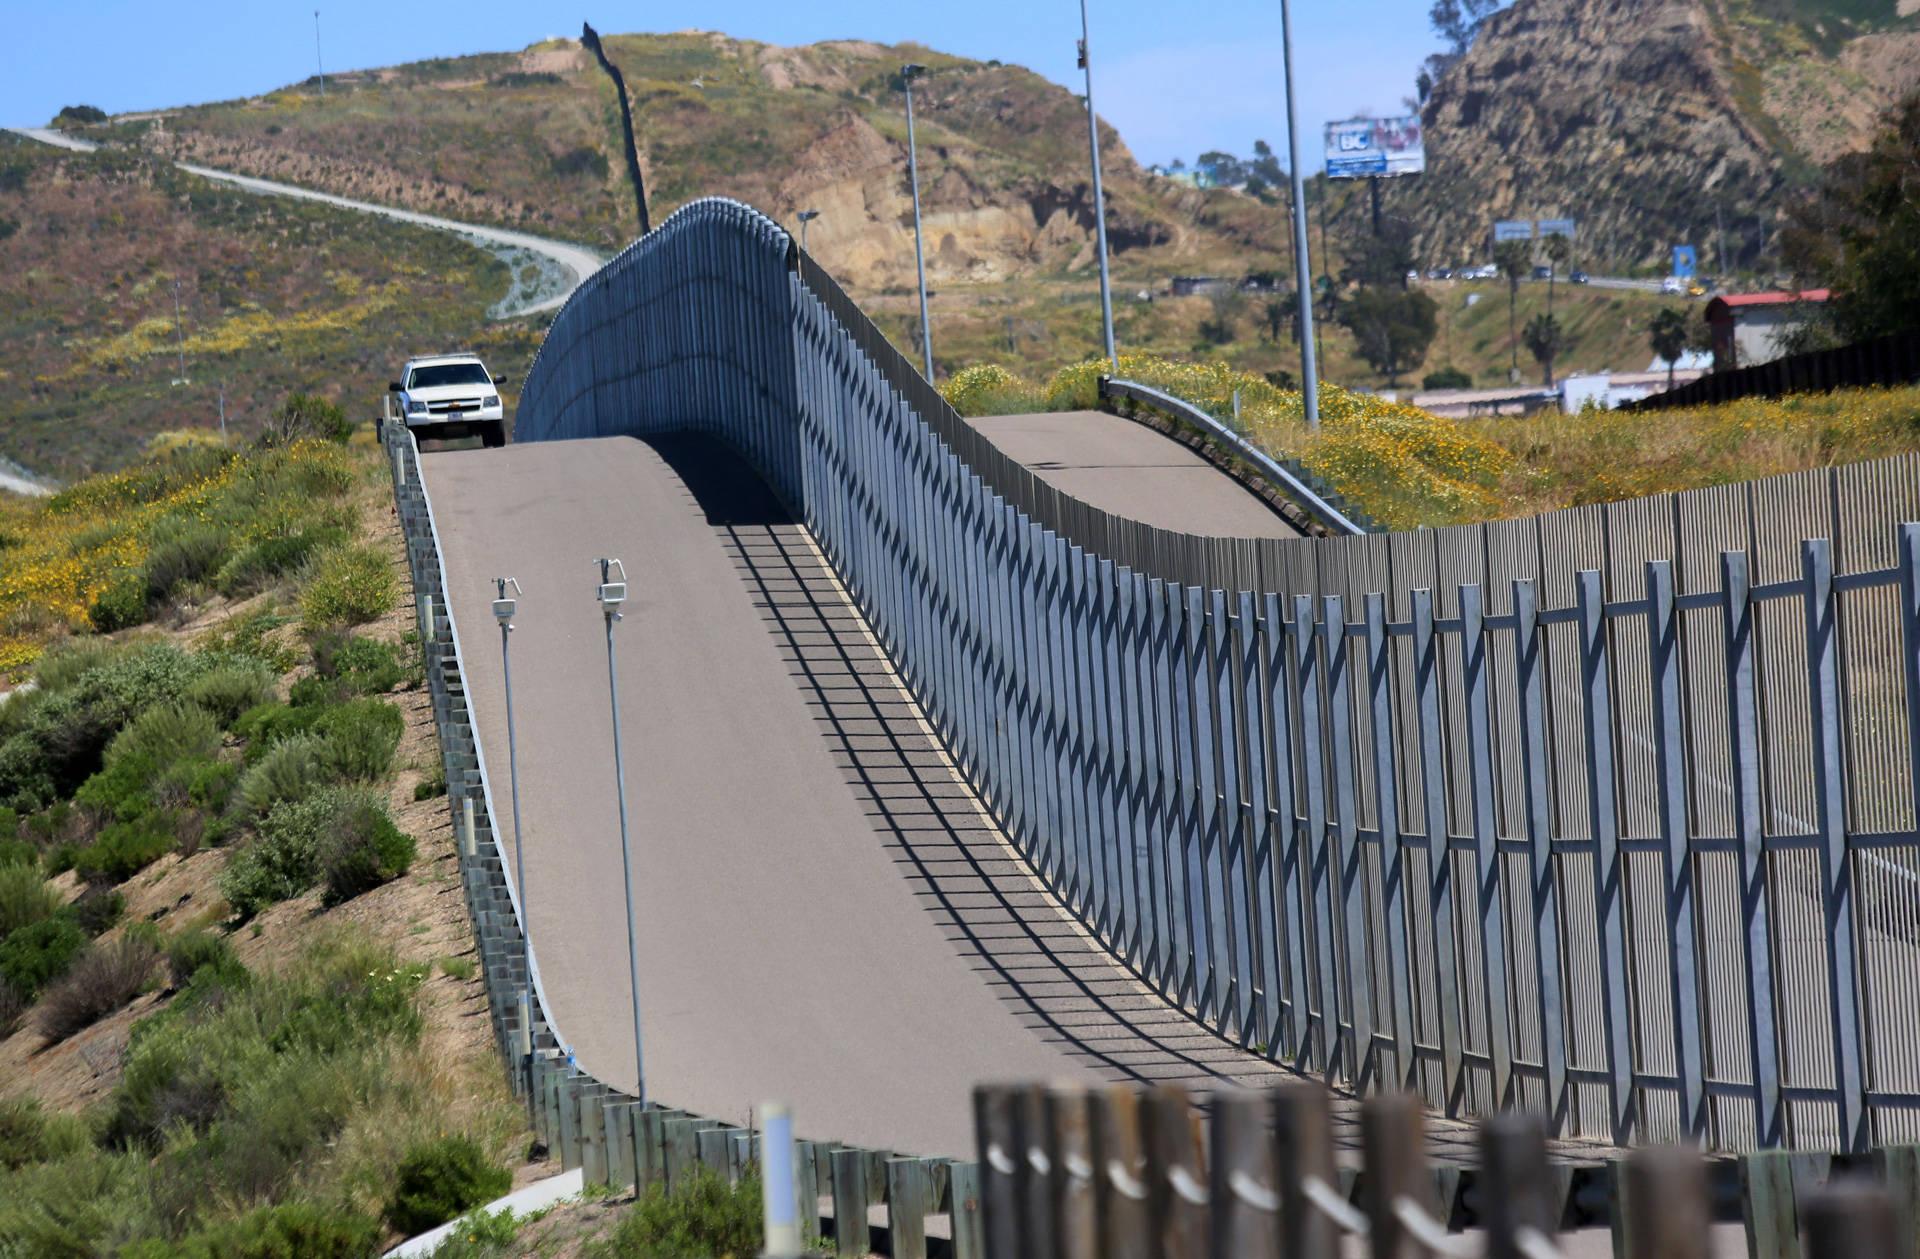 Border Patrol agents patrol the U.S.-Mexico border near San Ysidro on Sunday, April 16, 2017. SANDY HUFFAKER/AFP/Getty Images